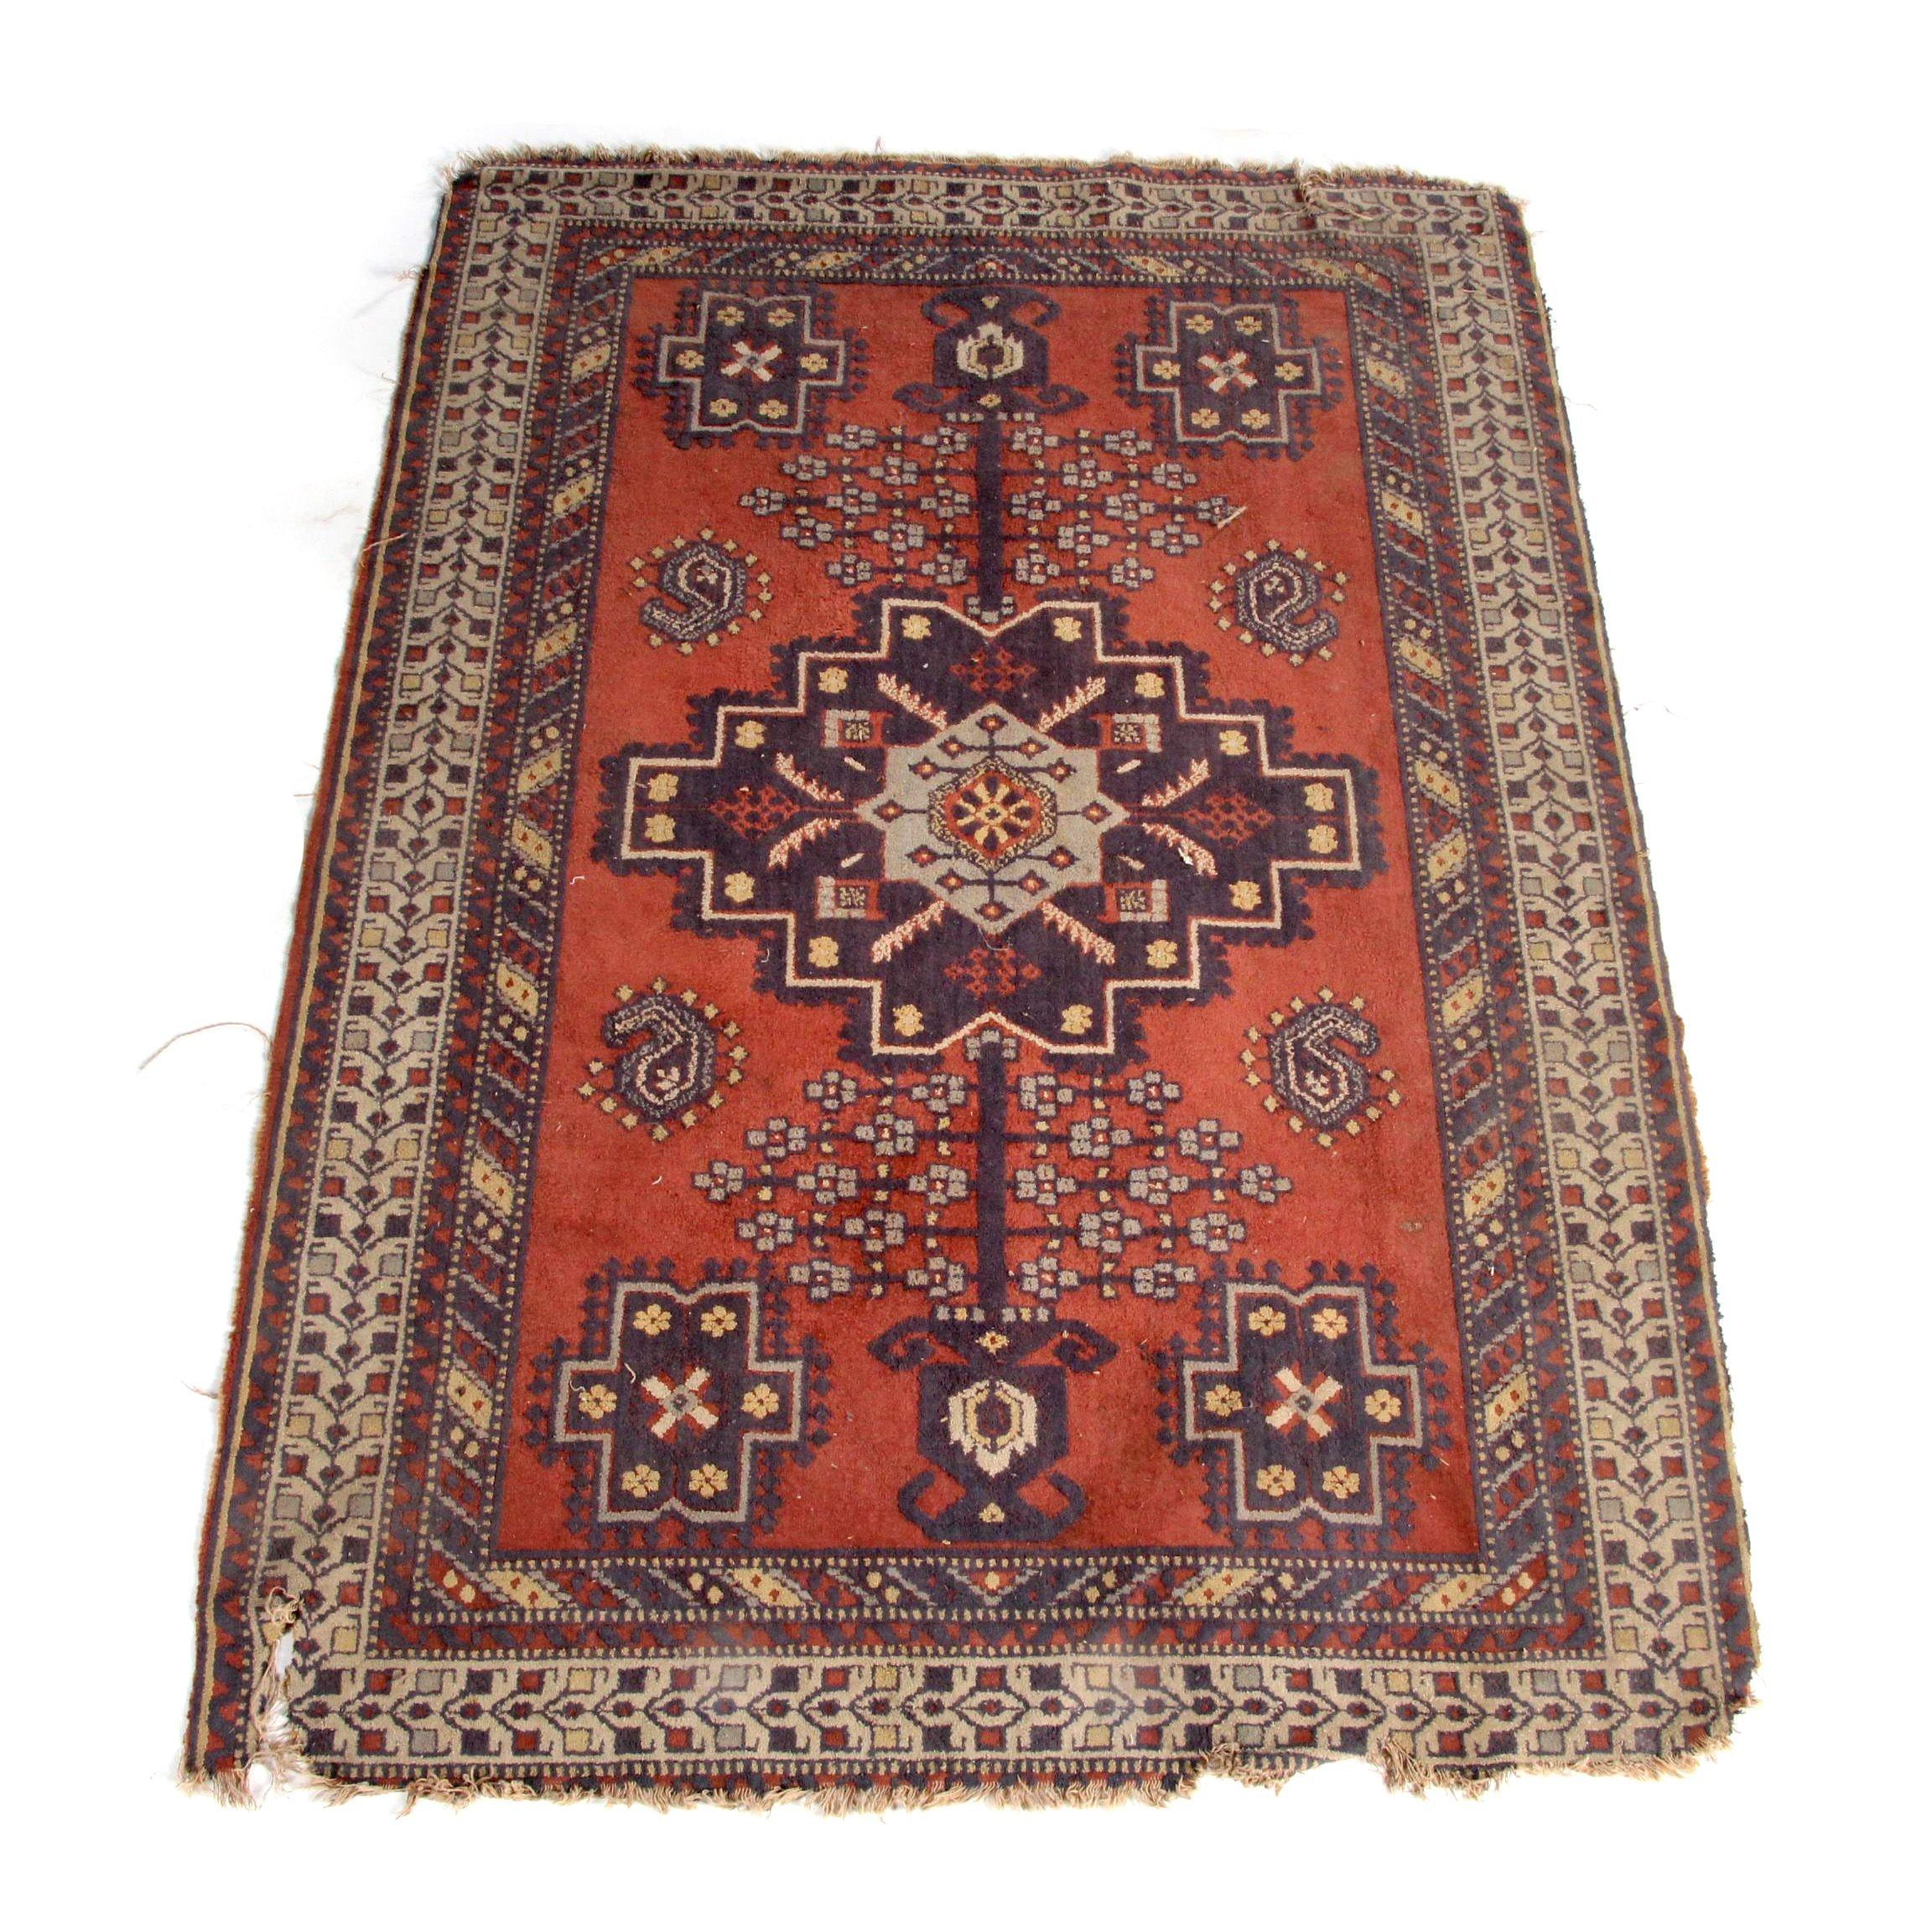 Vintage Power-Loomed Kazak Style Wool Accent Rug